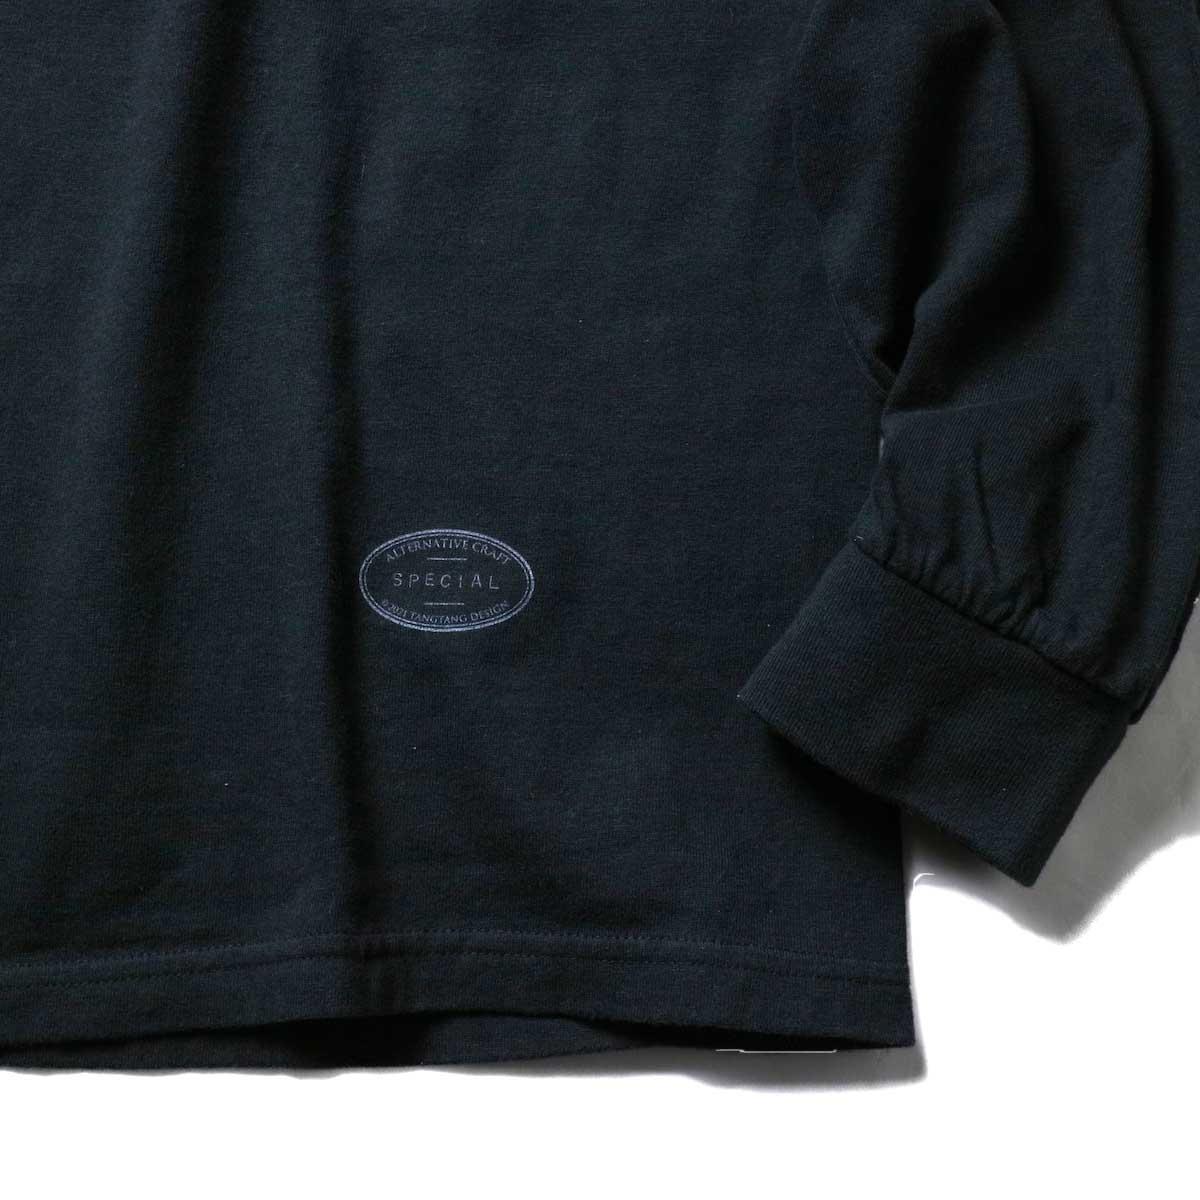 TANGTANG / ARCHIVE -SLOGAN- (Black)裾